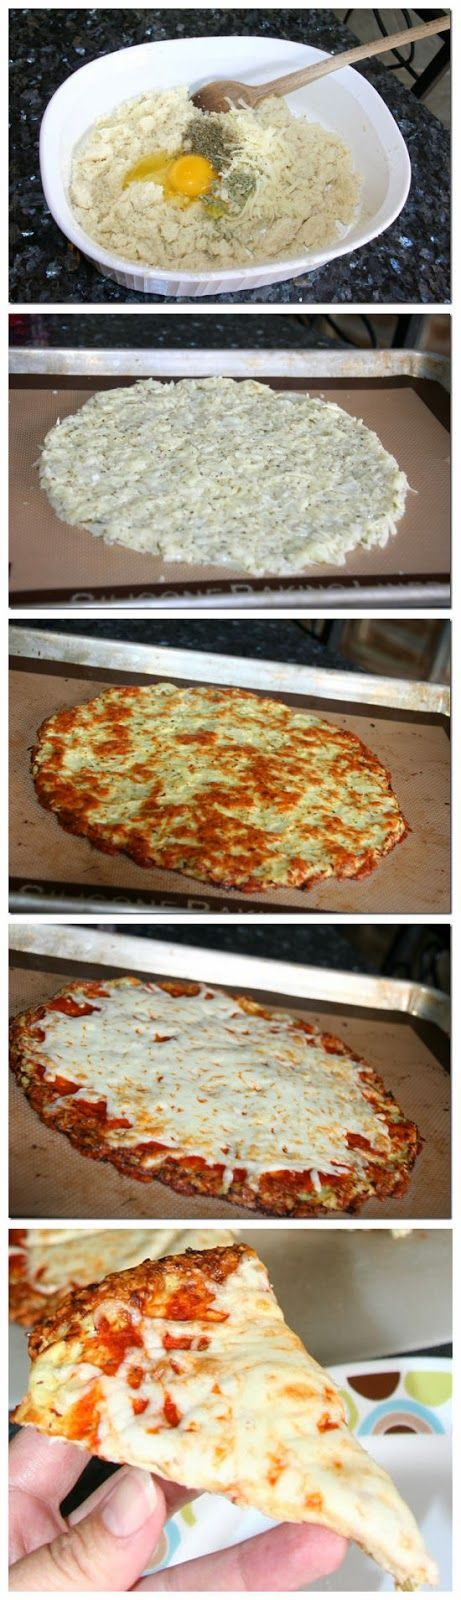 Cauliflower Crust Pizza! I can eat